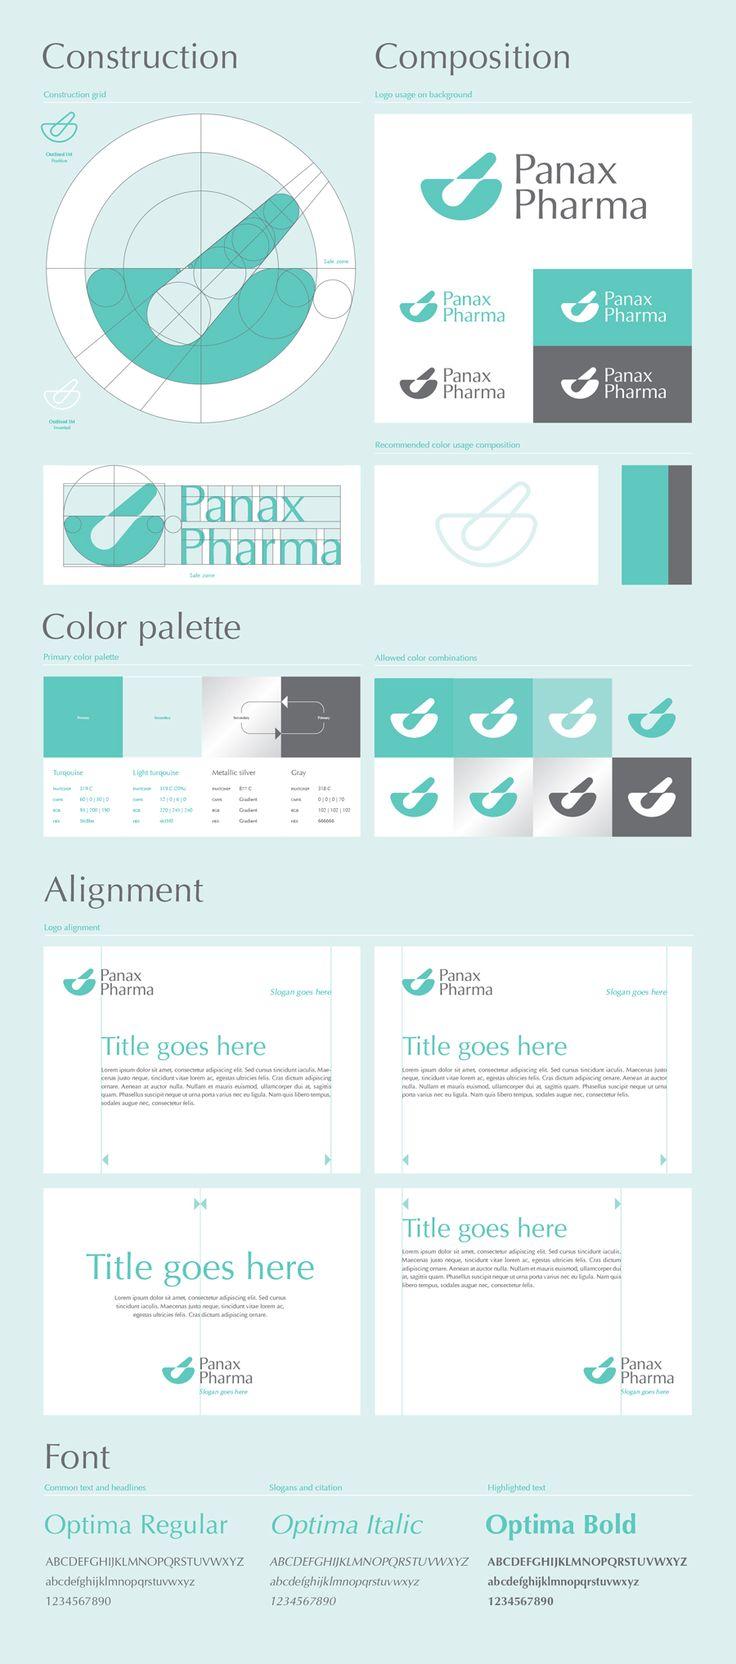 Panax Pharma logo design guidelines.